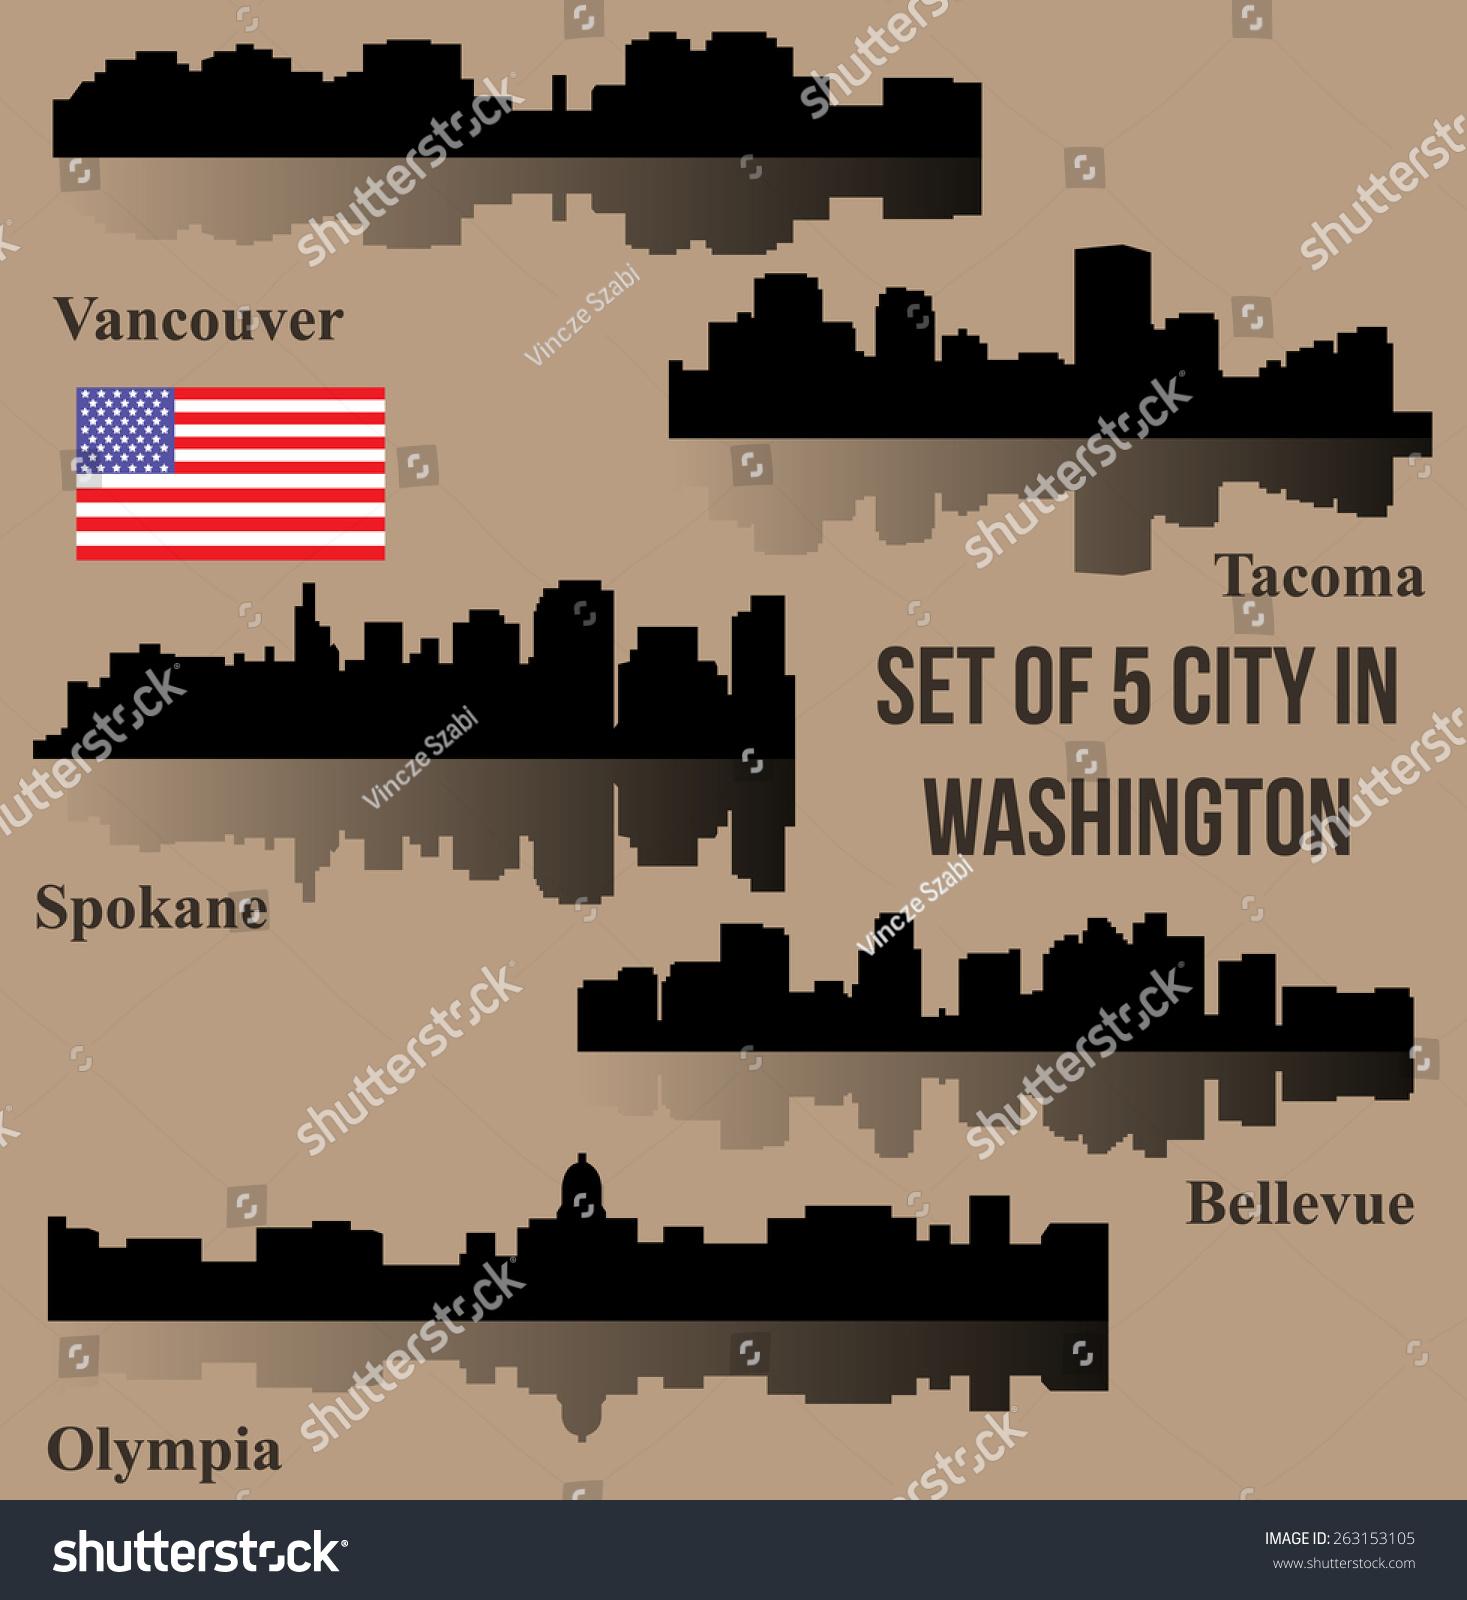 Washington, DC Metro City Guide - Citysearch